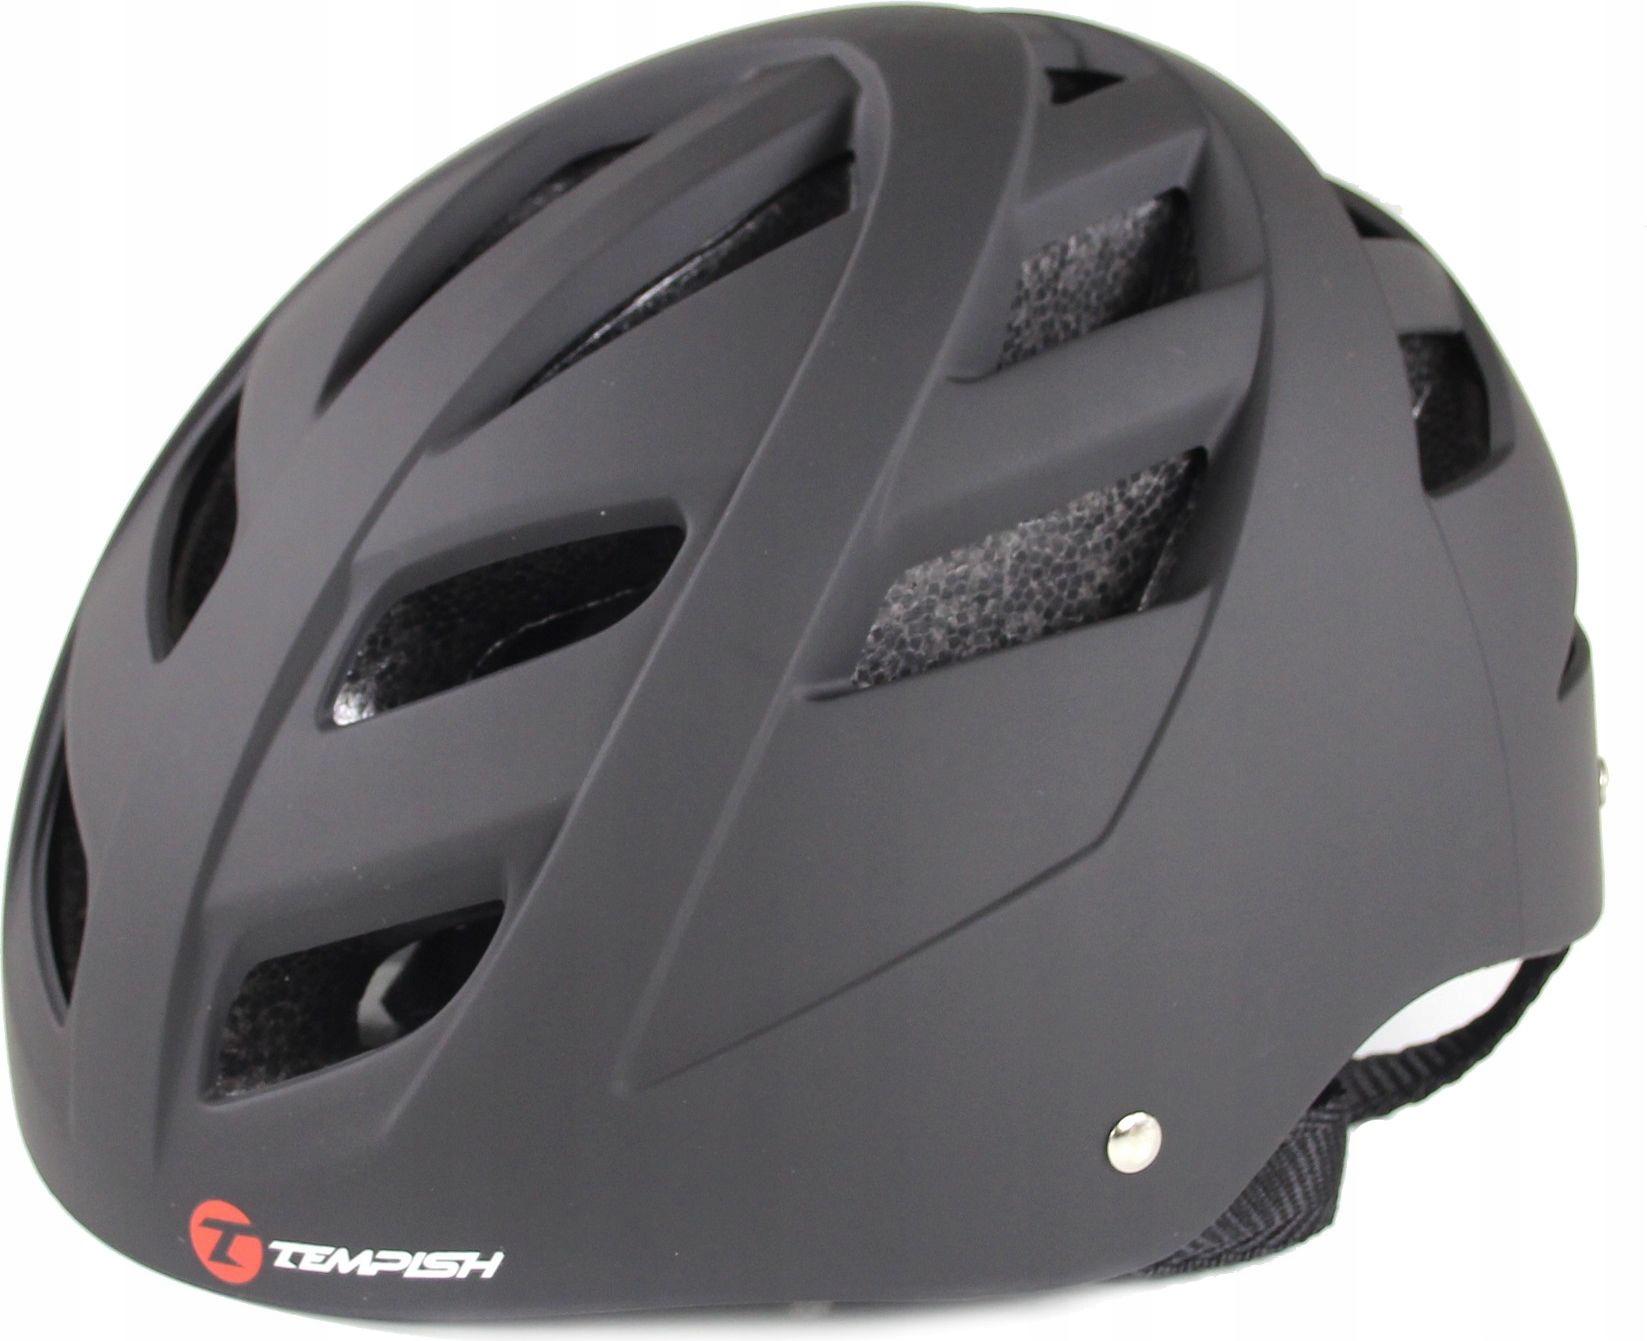 TEMPISH Helmet Marilla s